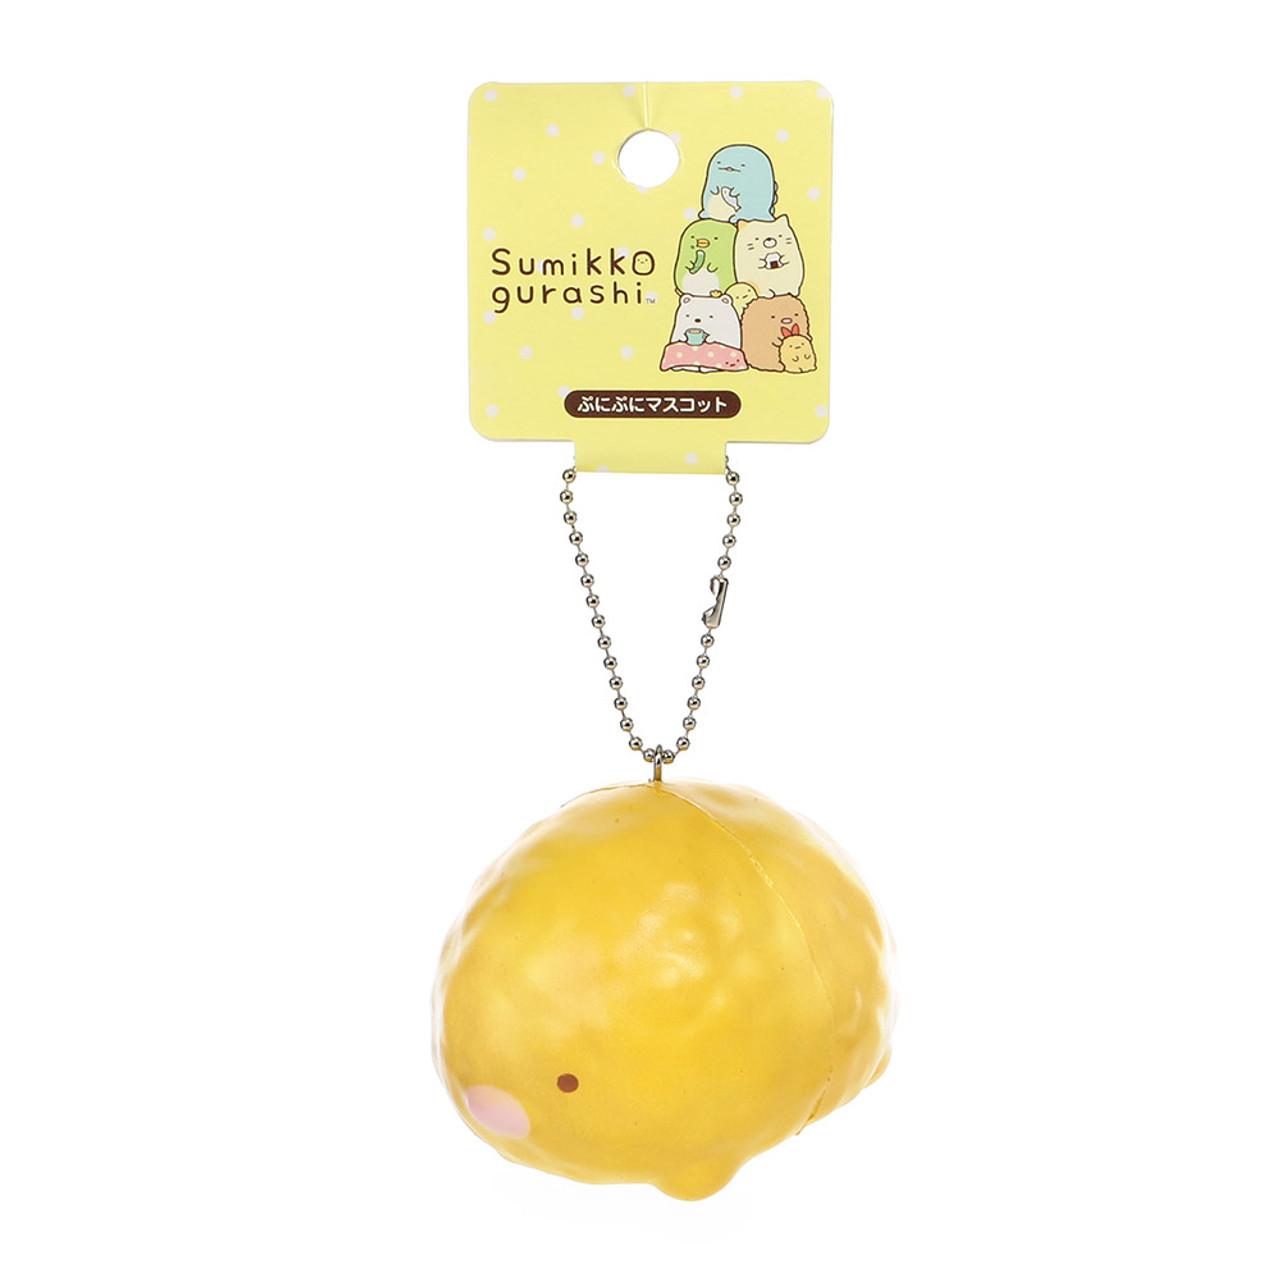 San-x Sumikko Gurashi Tsum Tsum Style Tonkatsu Pork Cutlet Squishy Toys Charms ( Tag Front View )